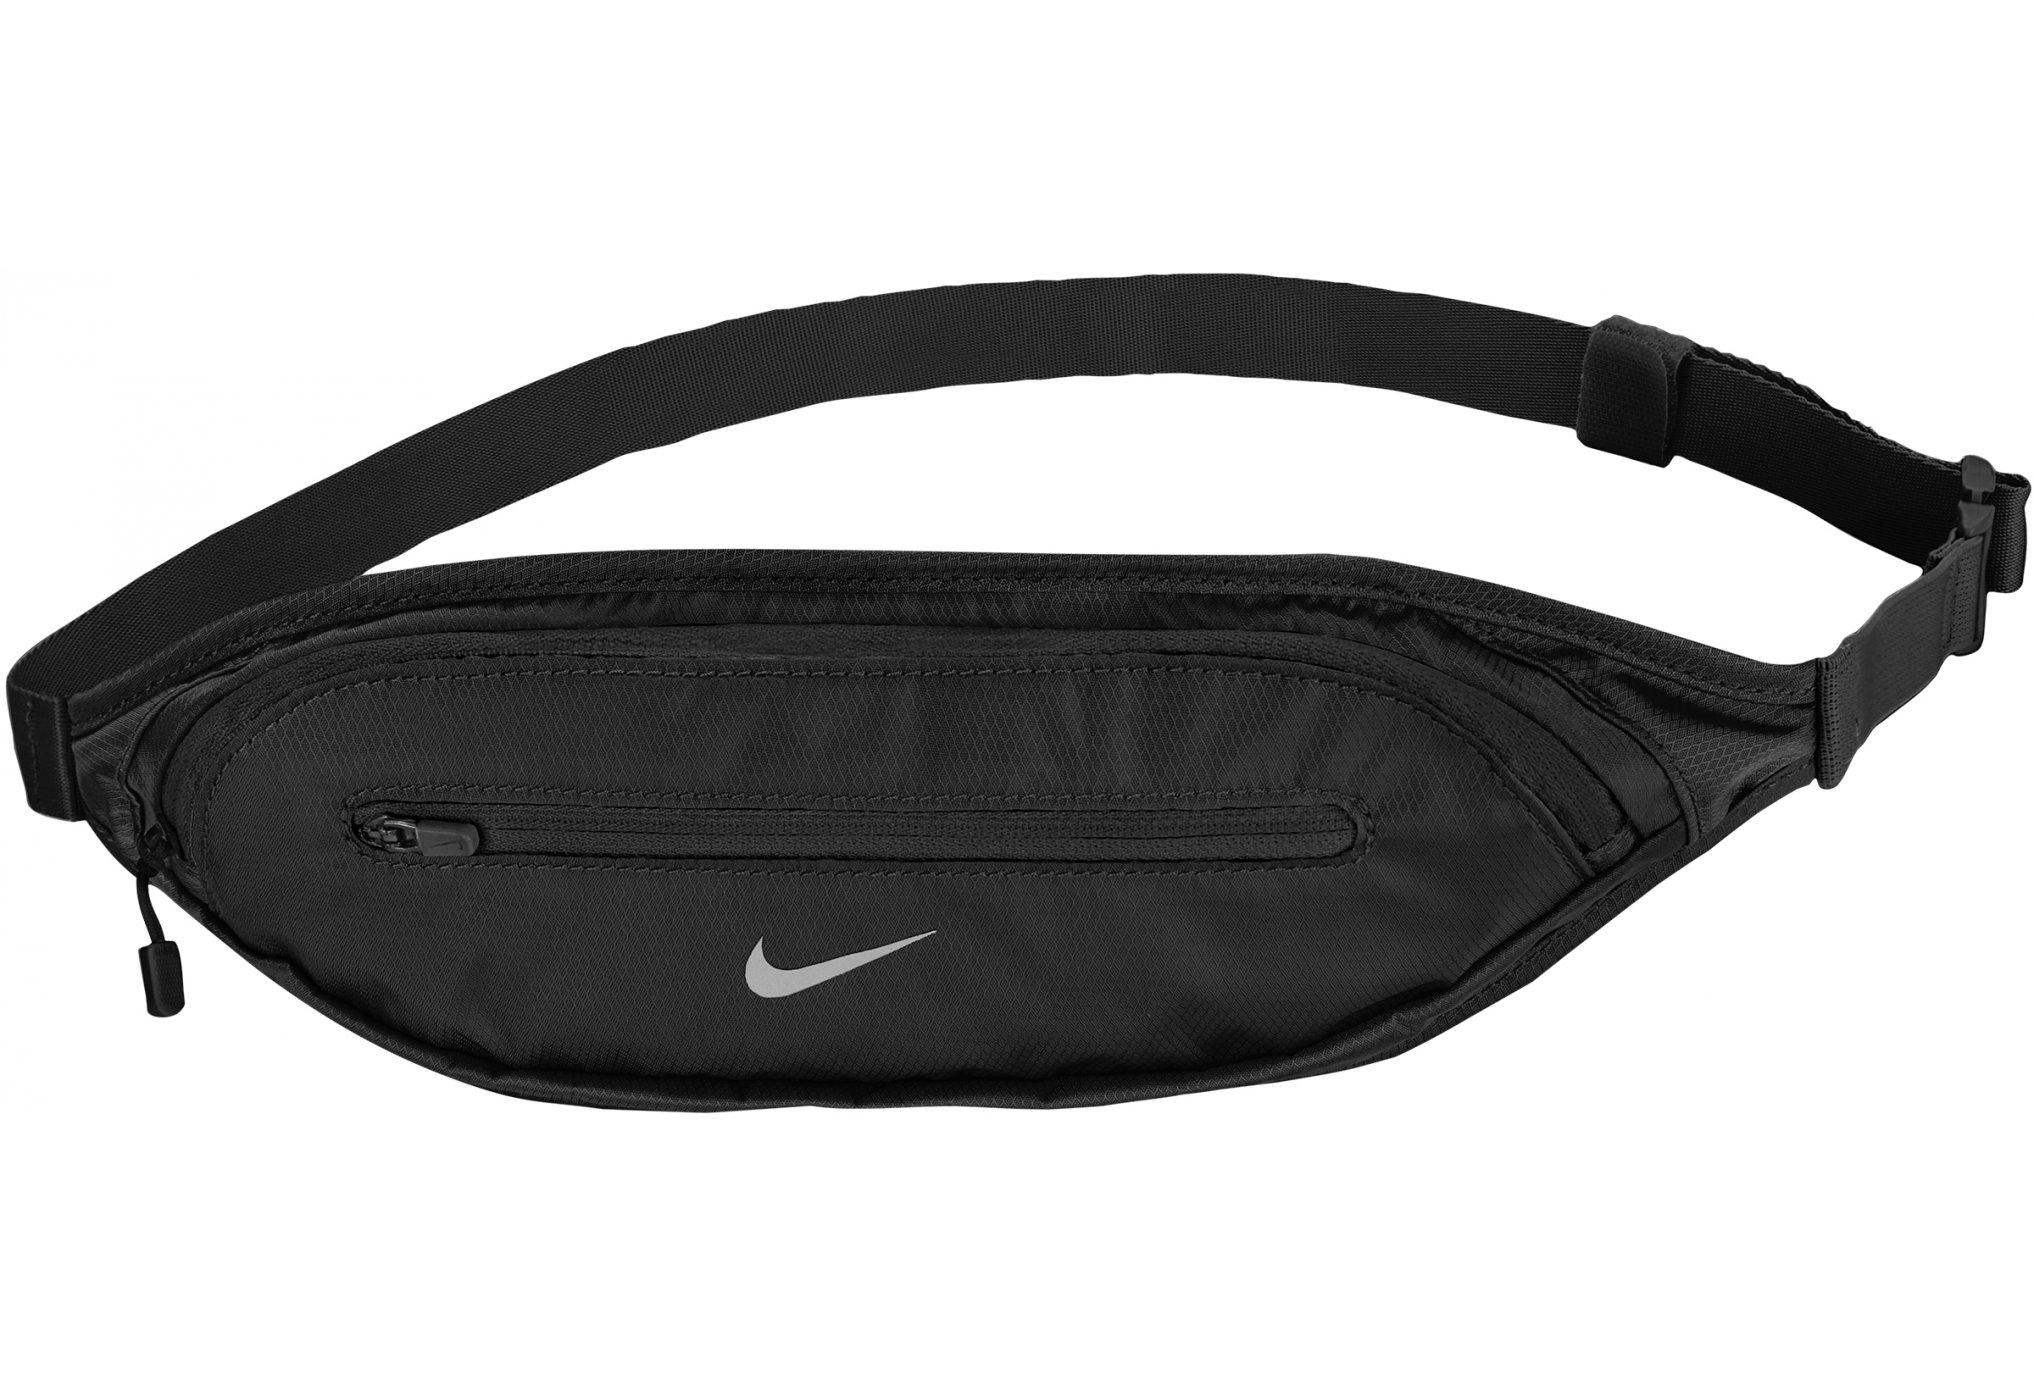 Nike Capacity Waistpack 2.0 - Large Ceinture / porte dossard